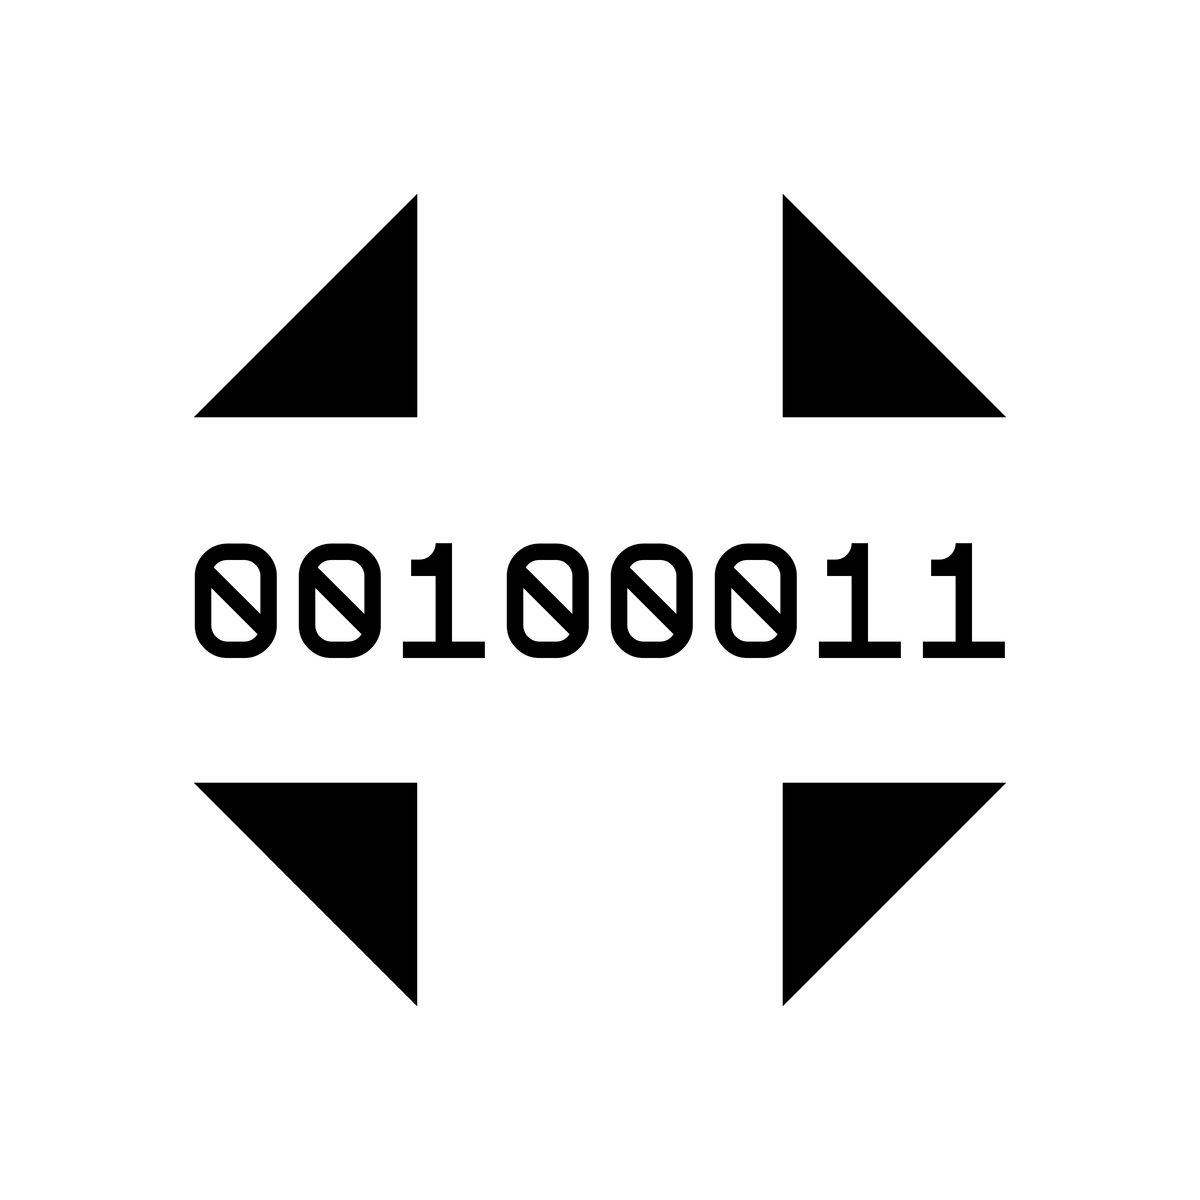 a3192720486_10.jpg